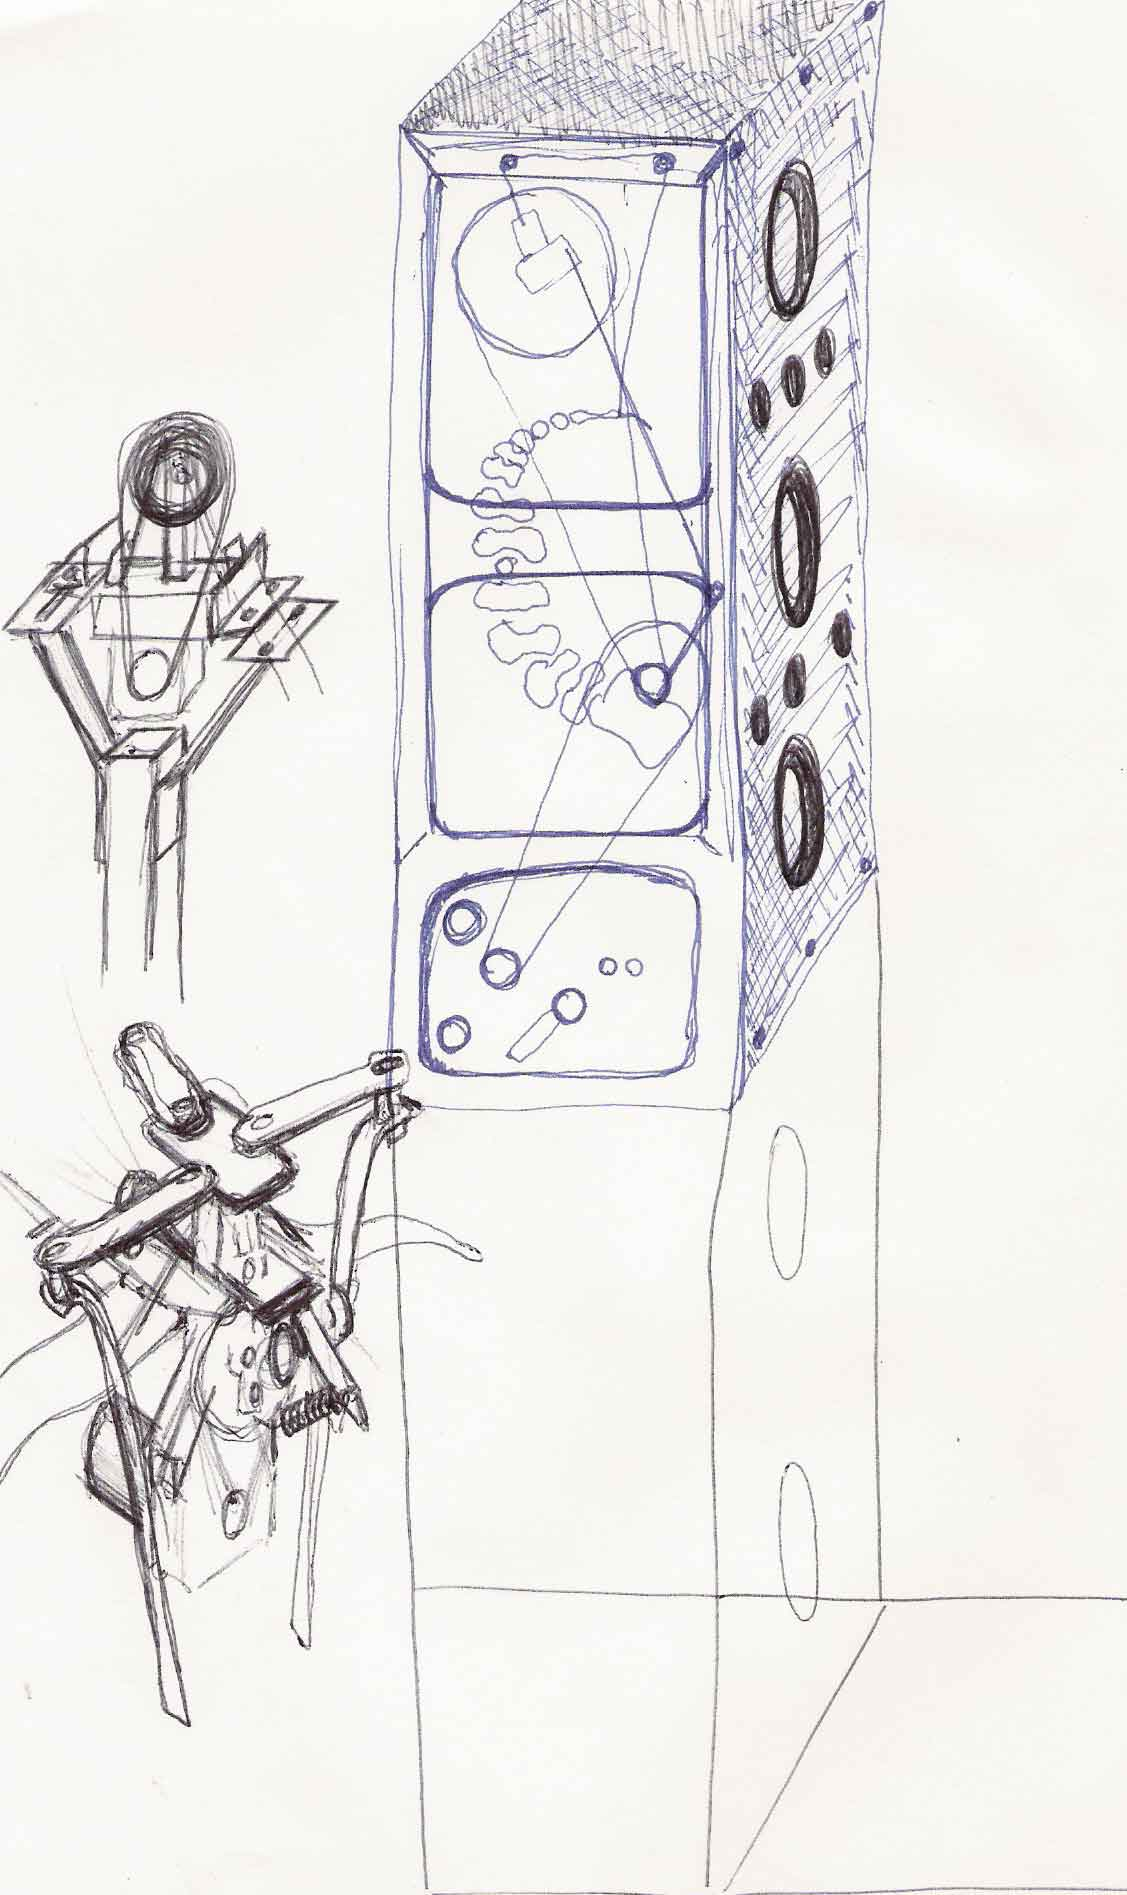 sketch-50-sept-05.jpg